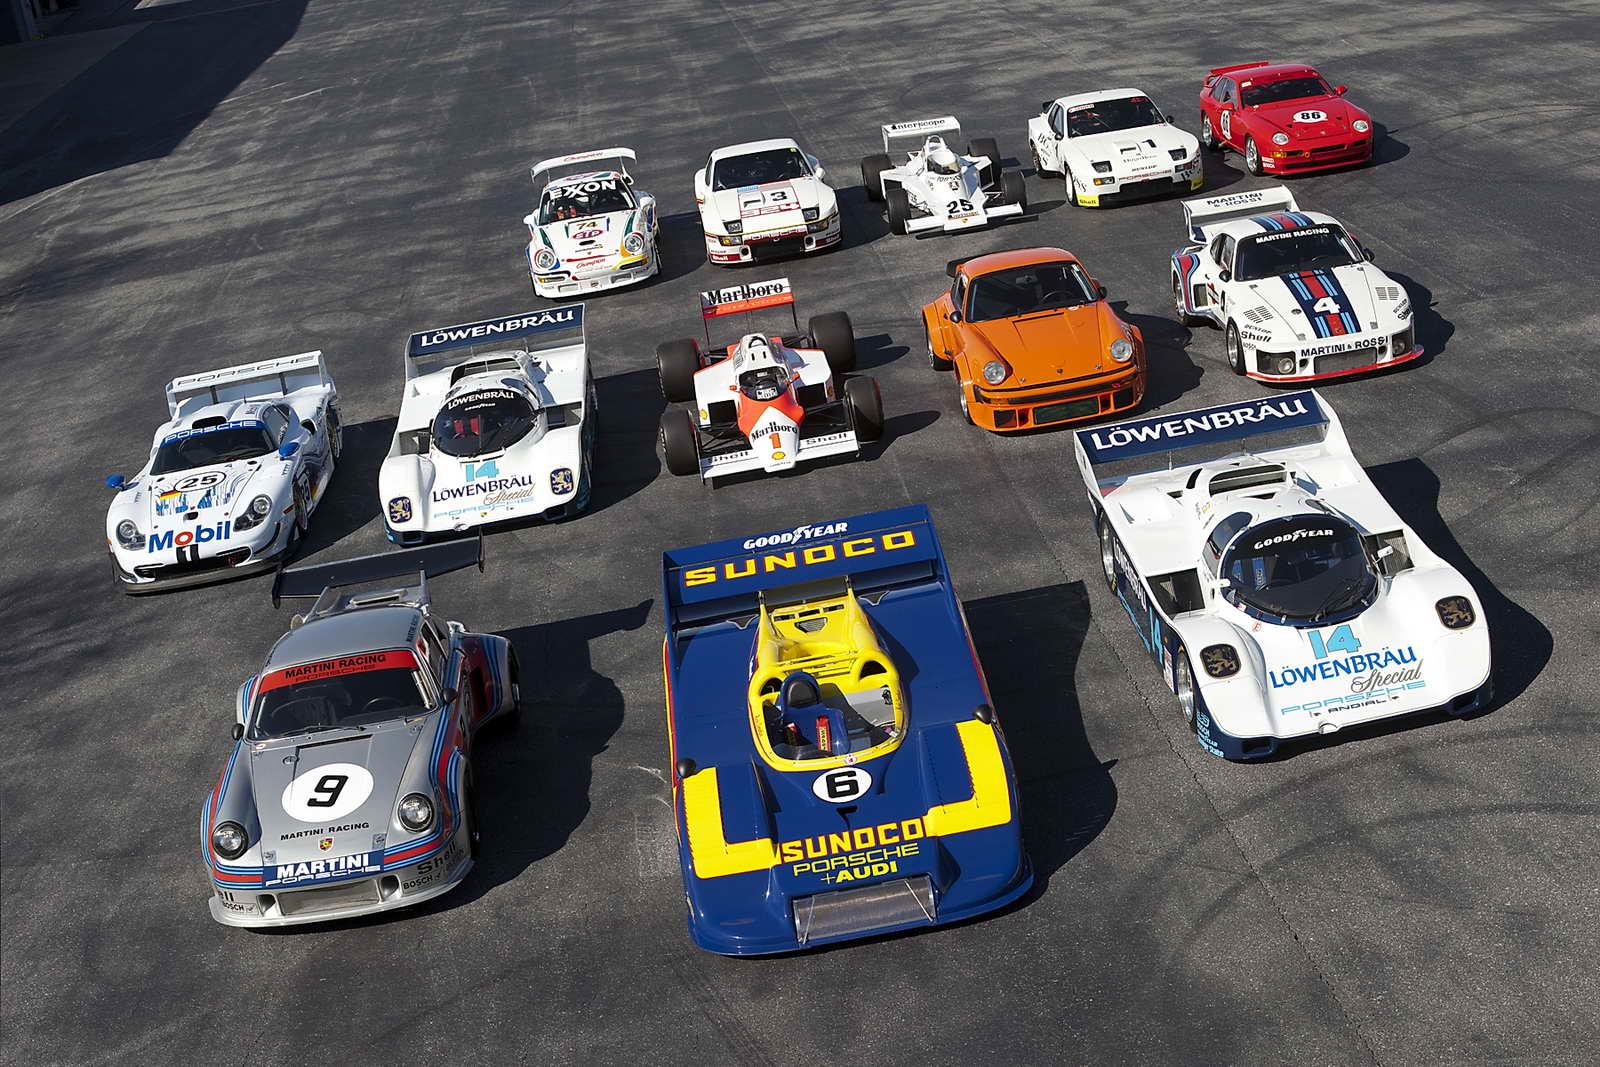 Drendel_Family_Porsche_Collection_01